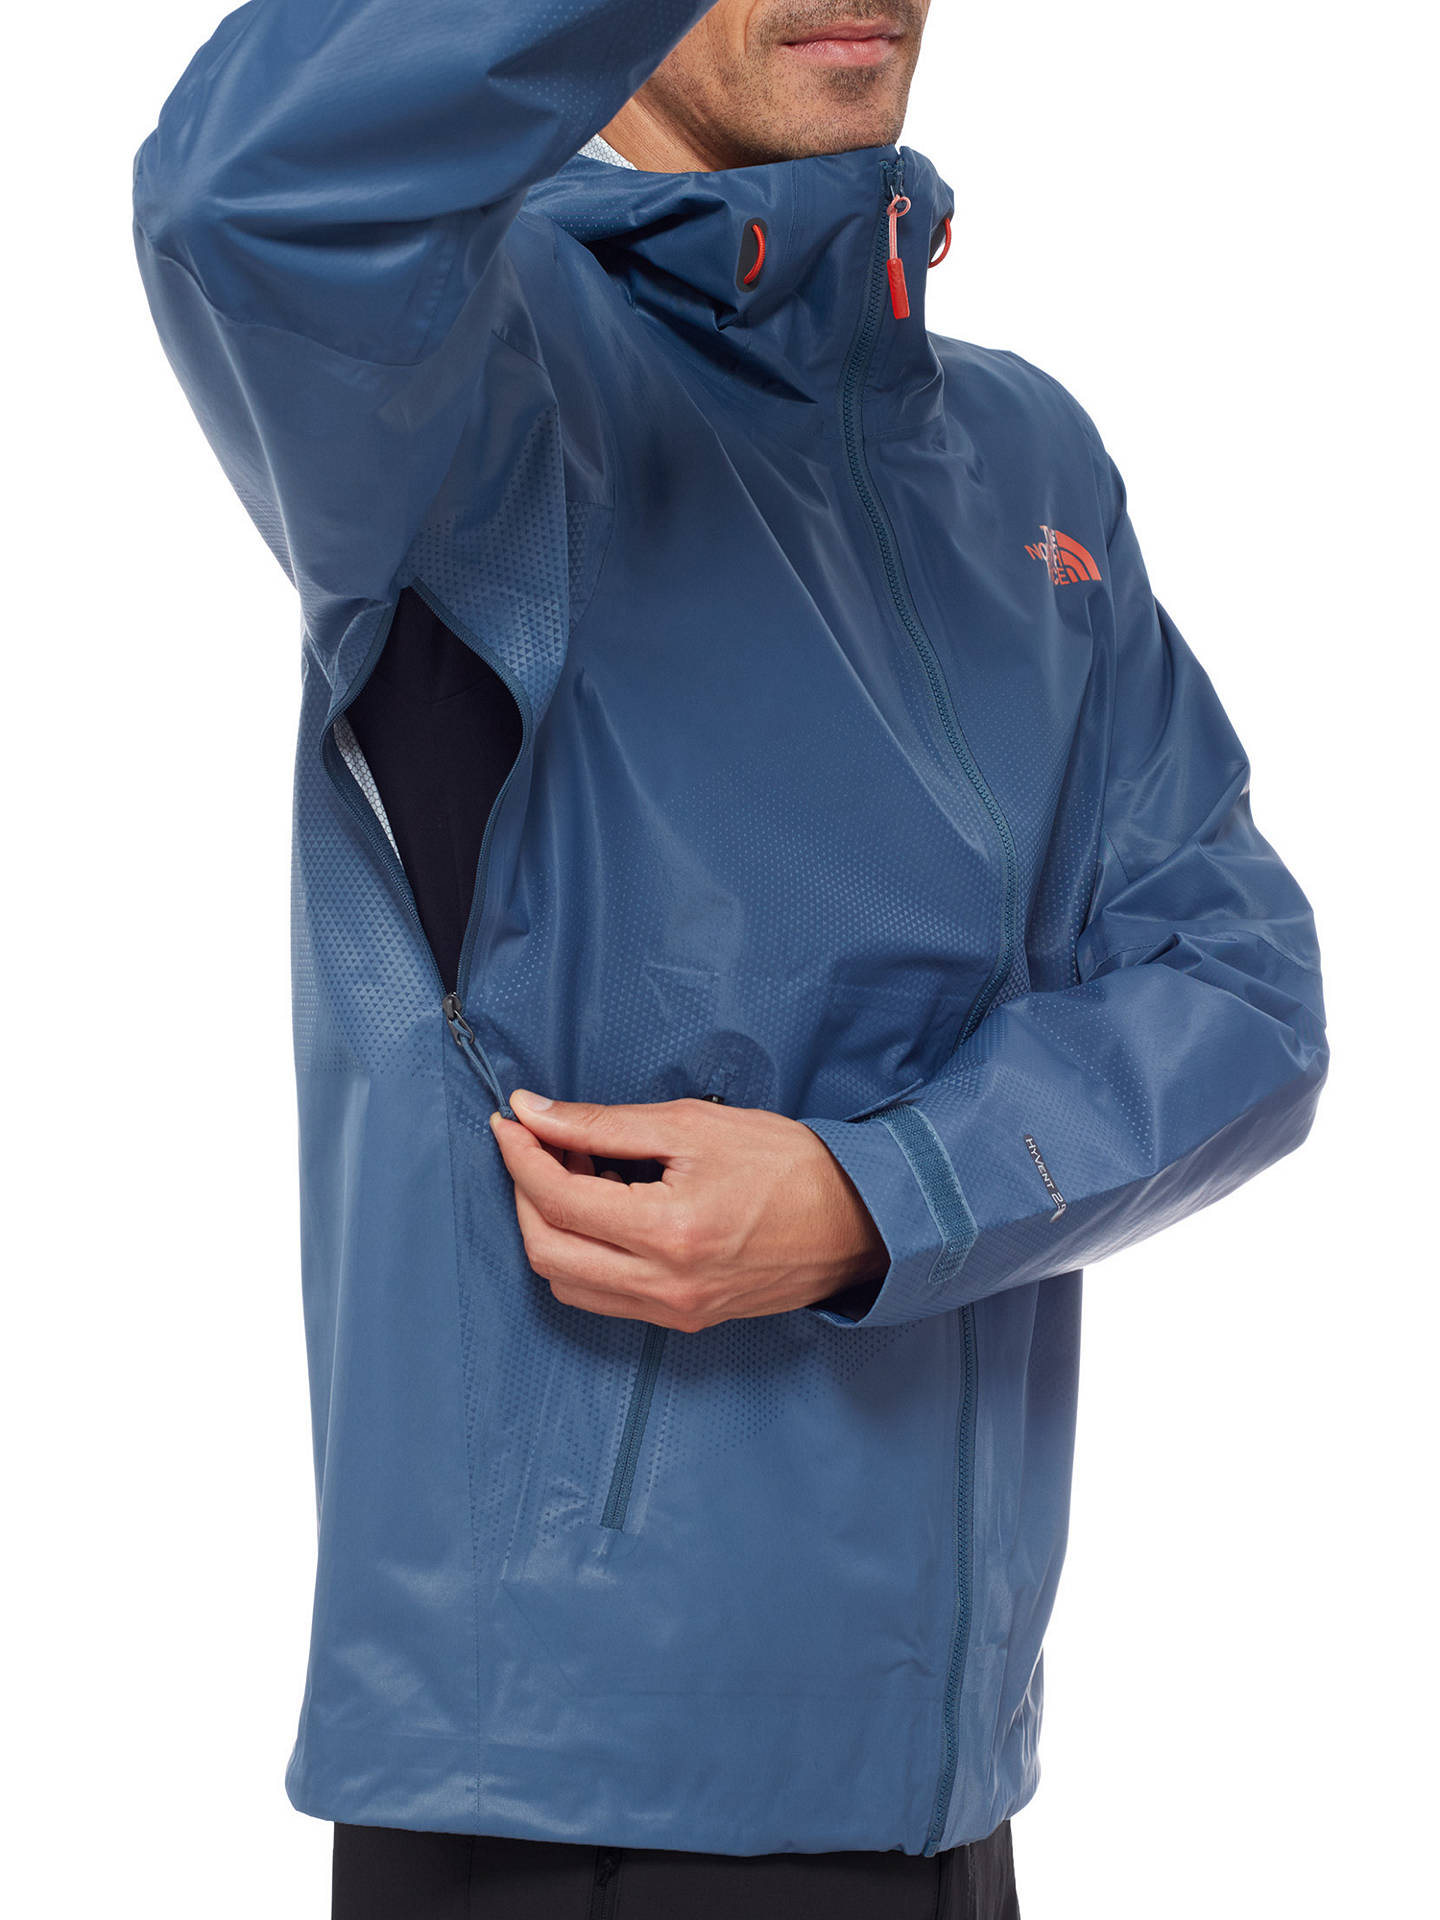 bd8772509 The North Face FuseForm Dot Waterproof Men's Jacket at John Lewis ...